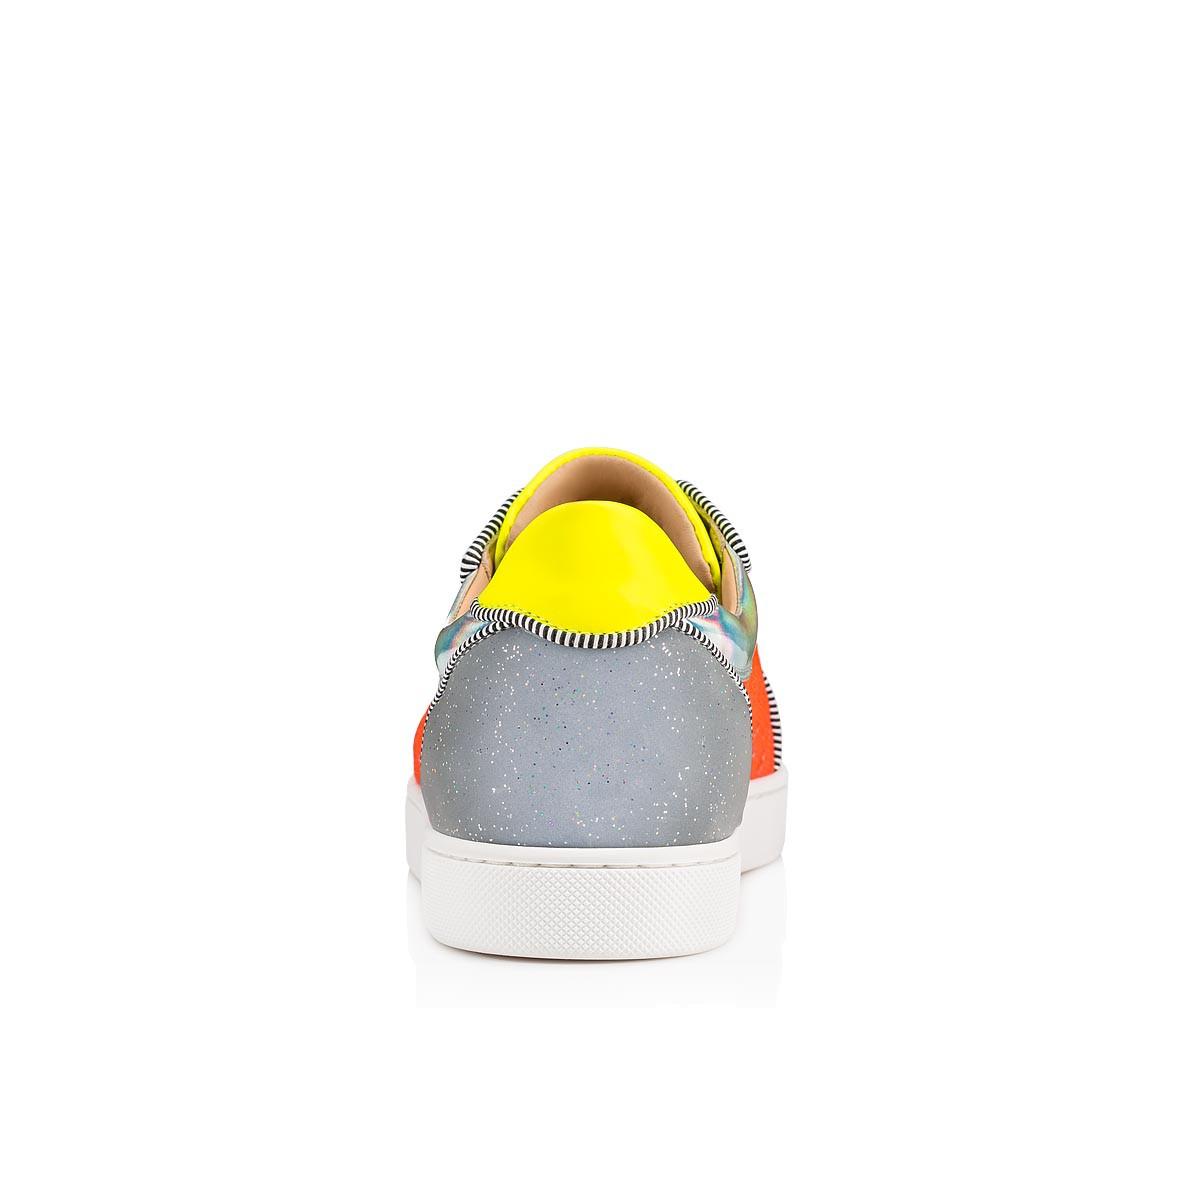 half off e88e8 153b6 Christian Louboutin Vieira Spikes Orlato Unisex Sneakers - Muliticolor in  SneakerStad